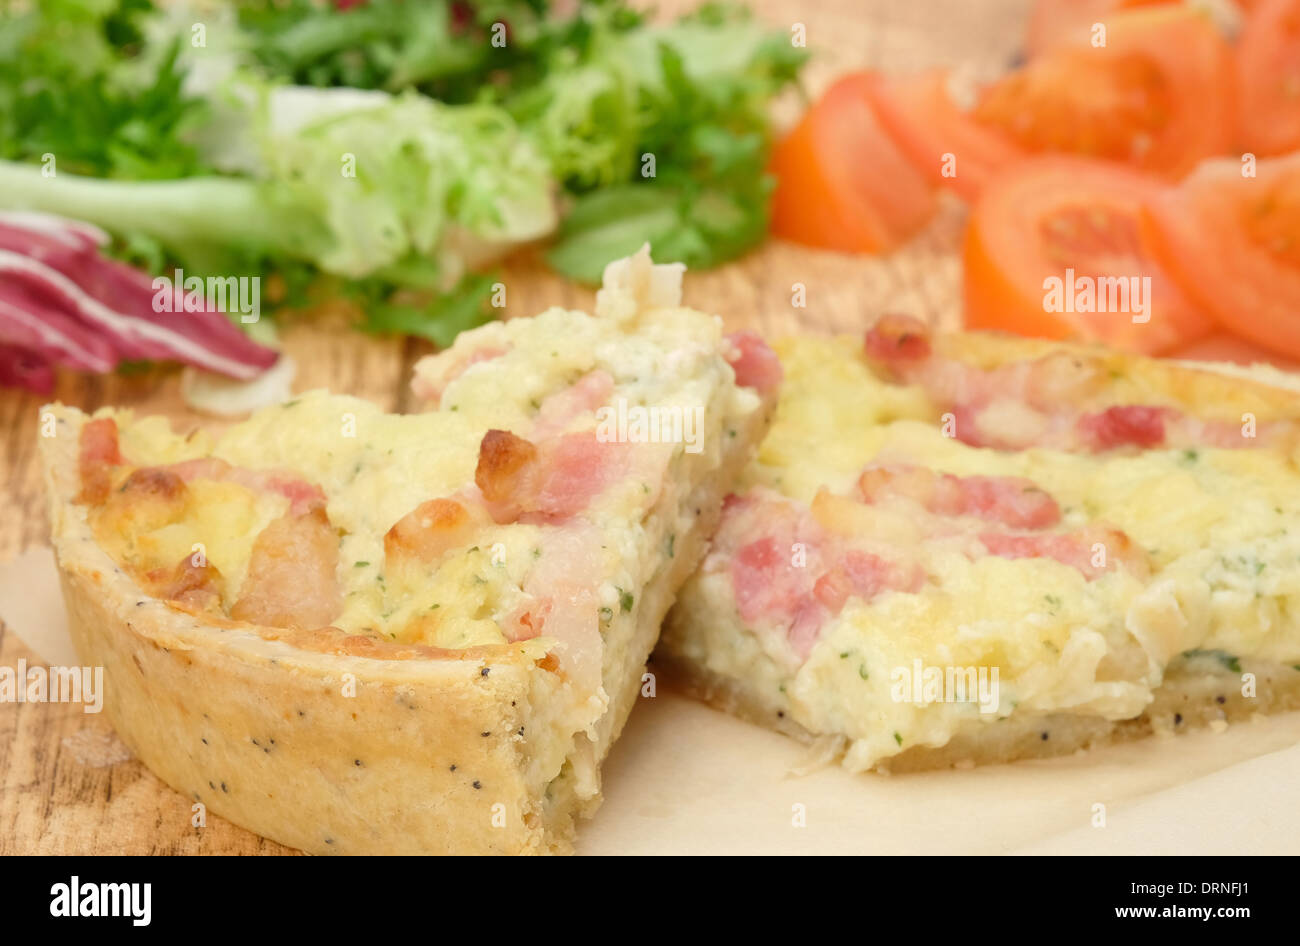 Fromage et bacon Quiche lorraine - studio shot Photo Stock